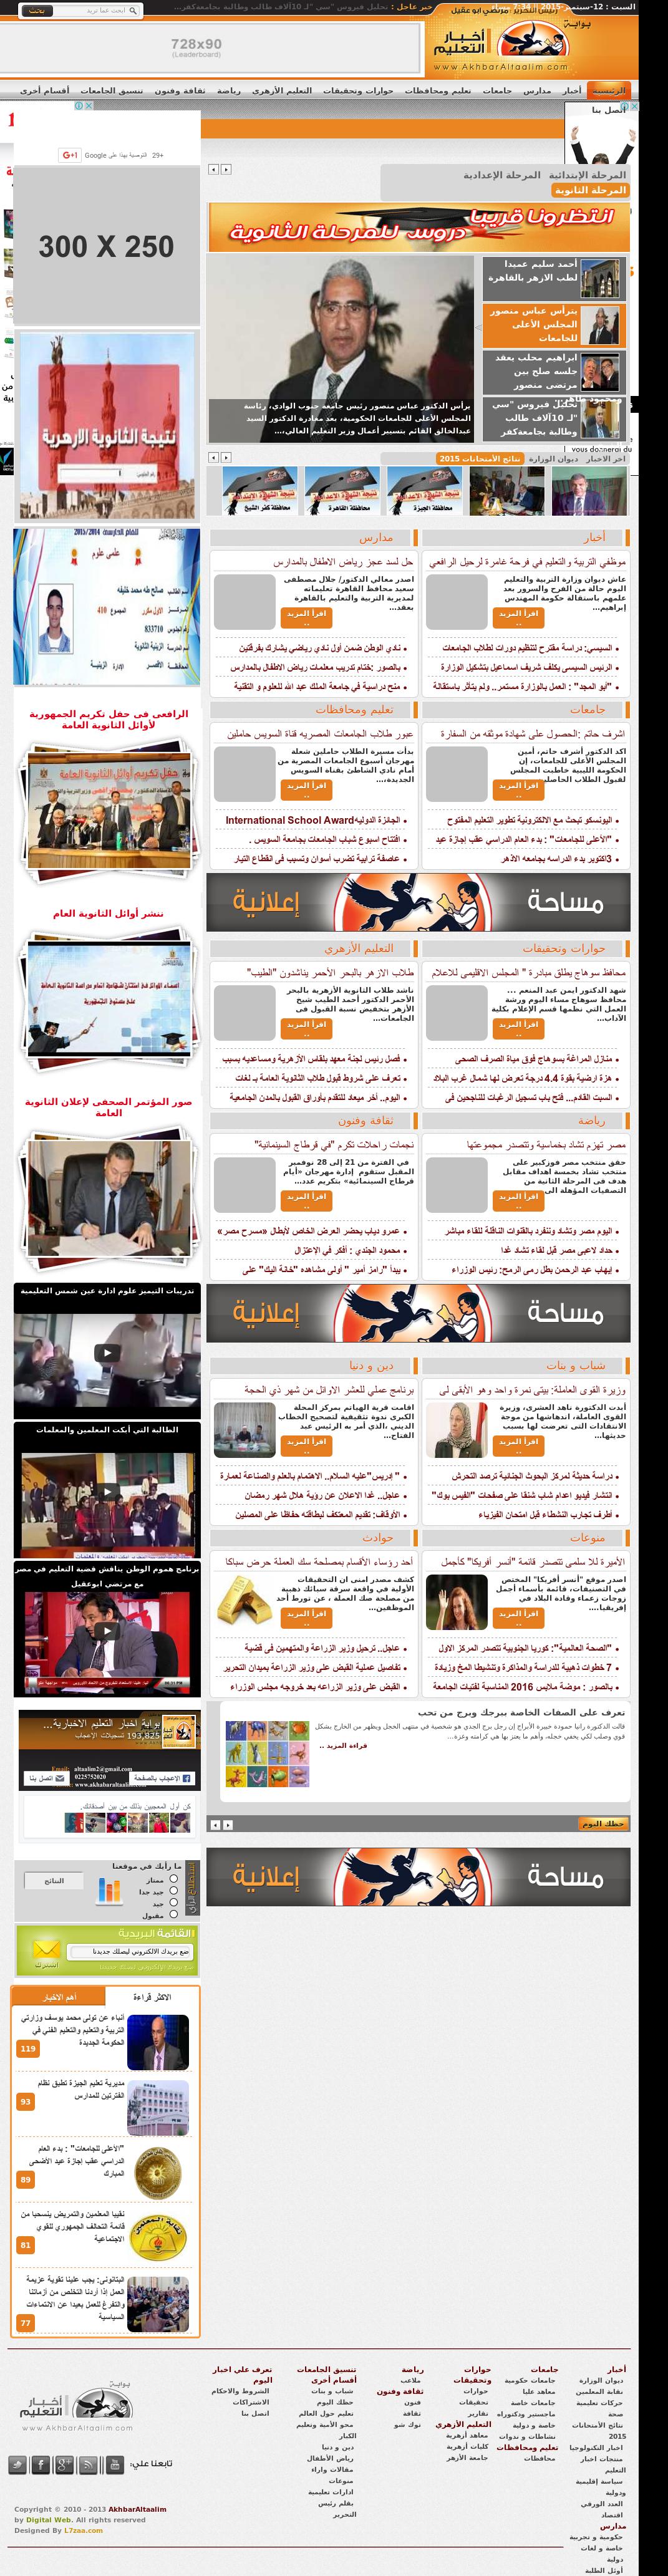 3b5f64f60 Akhbar Al Taalim News Gate Competitors, Revenue and Employees - Owler  Company Profile